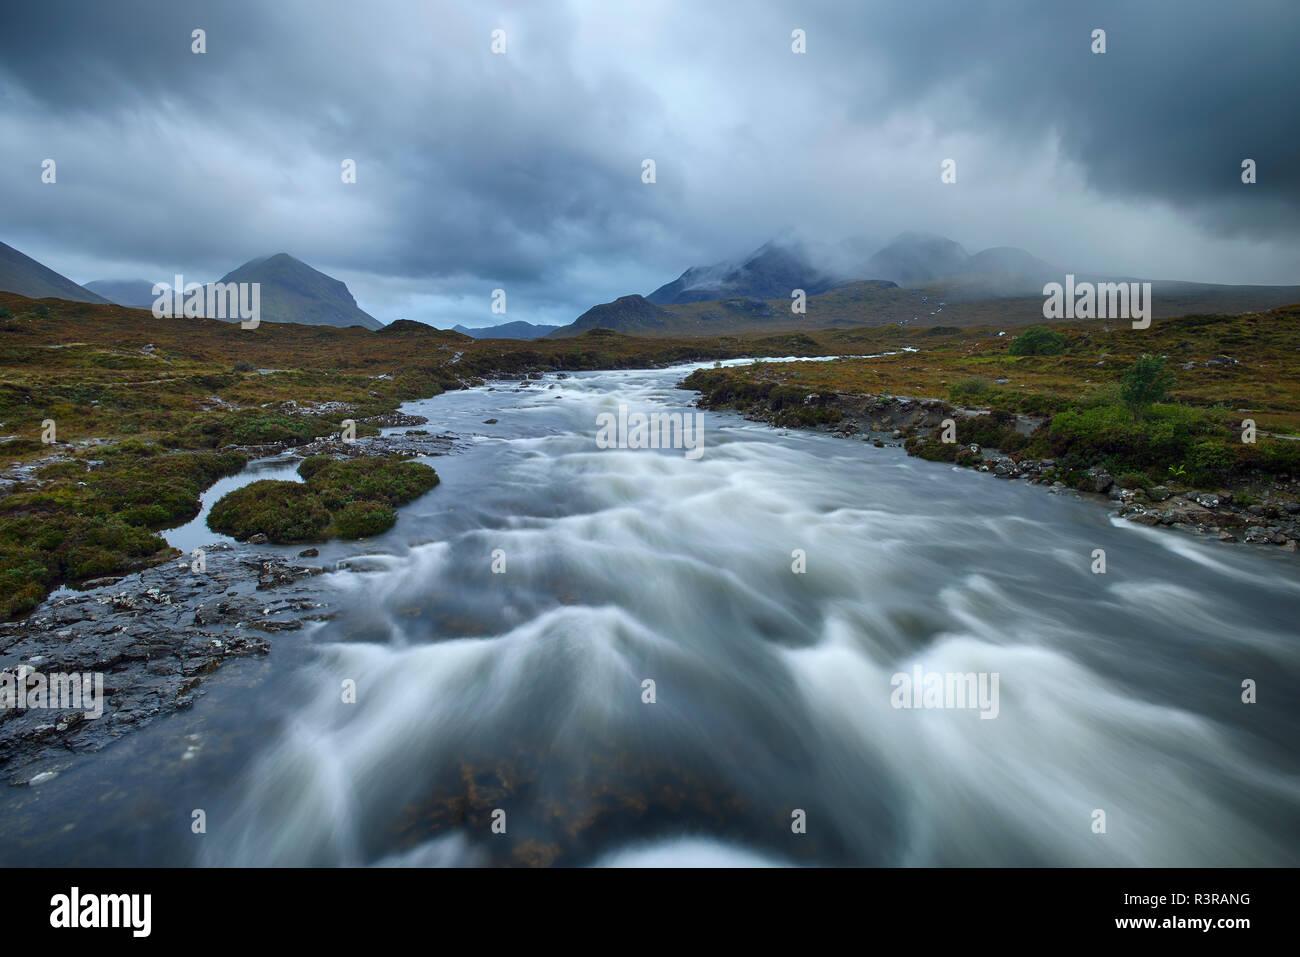 United Kingdom, Scotland, Scottish Highlands, Isle Of Skye, Cuillin Mountains, Sligachan River - Stock Image